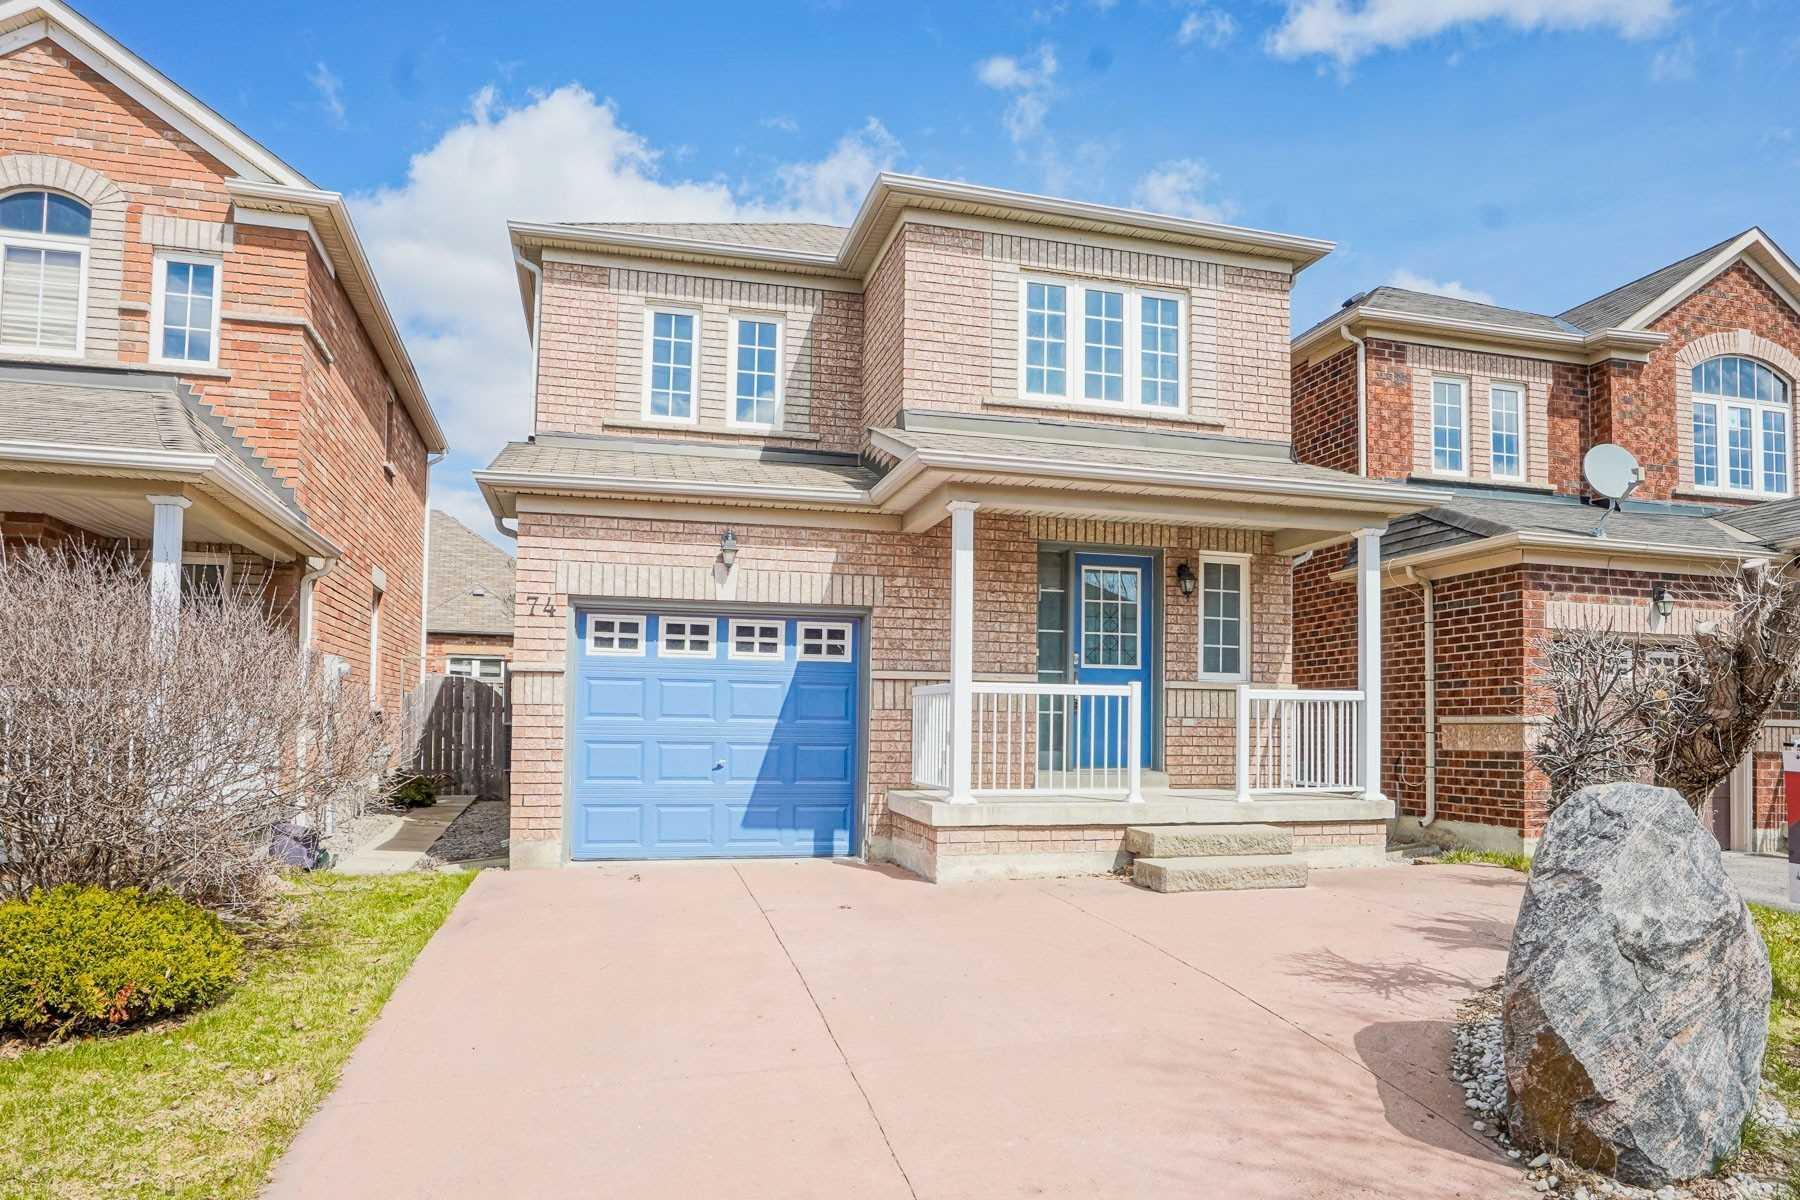 74 Victoria Wood Ave, Markham, Ontario L6E1K2, 3 Bedrooms Bedrooms, 7 Rooms Rooms,2 BathroomsBathrooms,Detached,For Sale,Victoria Wood,N4757063